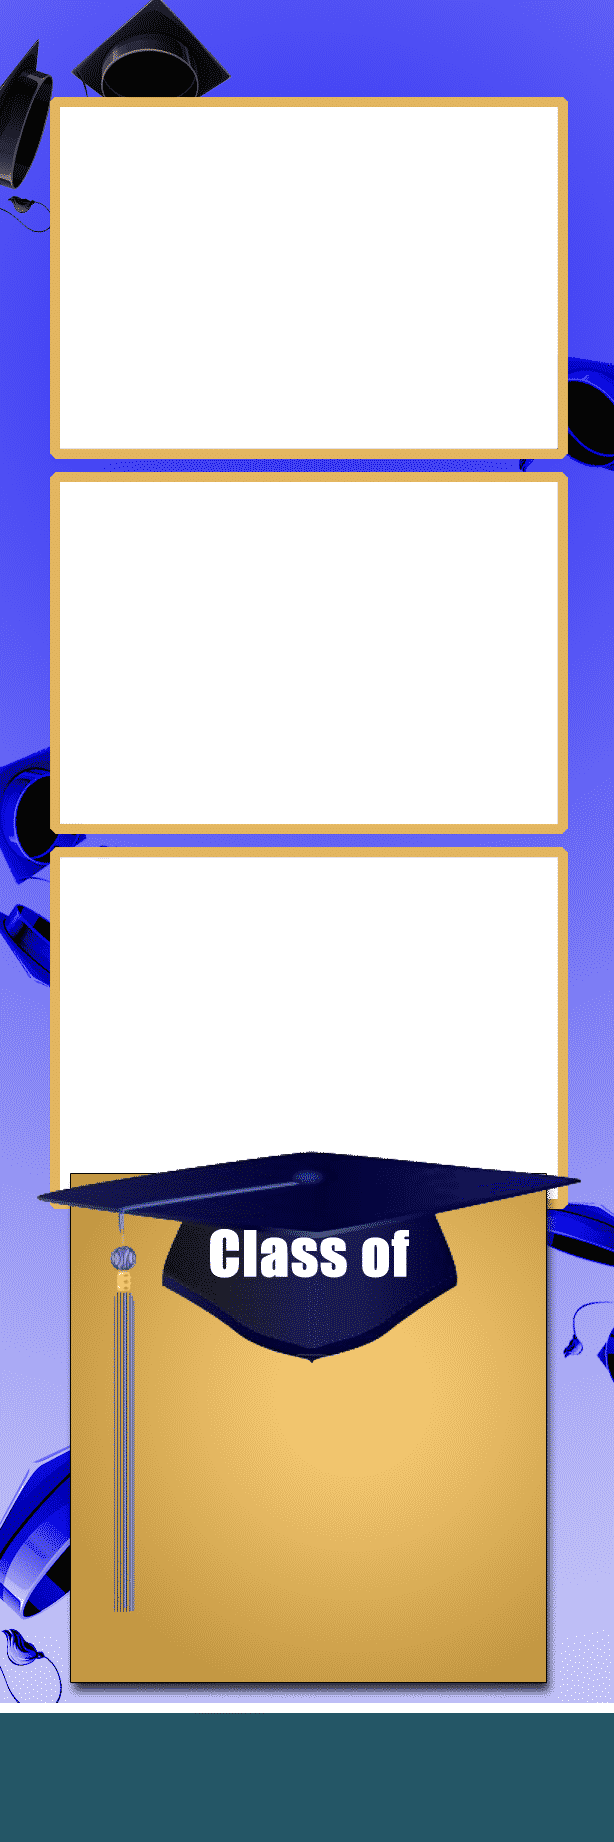 2086 - The Graduate